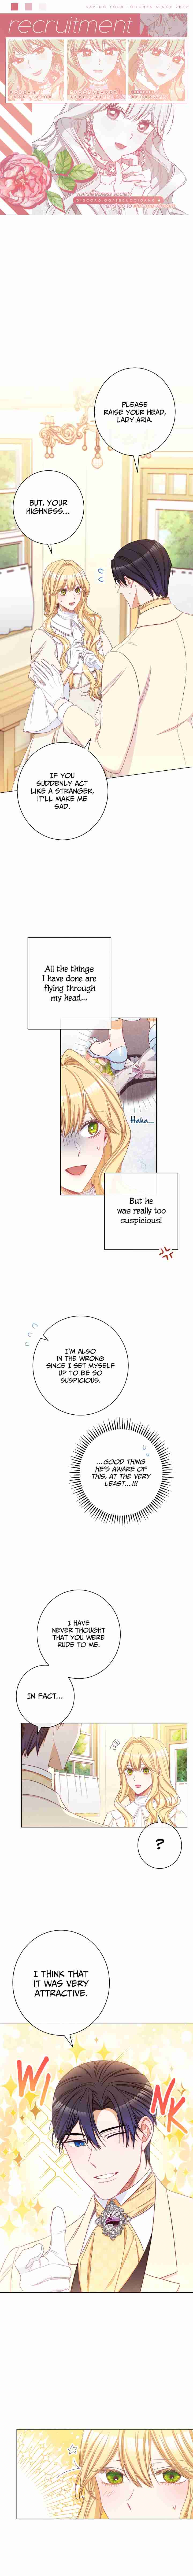 https://manga.mangadogs.com/comics/pic4/51/35315/2687132/6dec09e3b76007495b7be8ab647d85d2.jpg Page 1